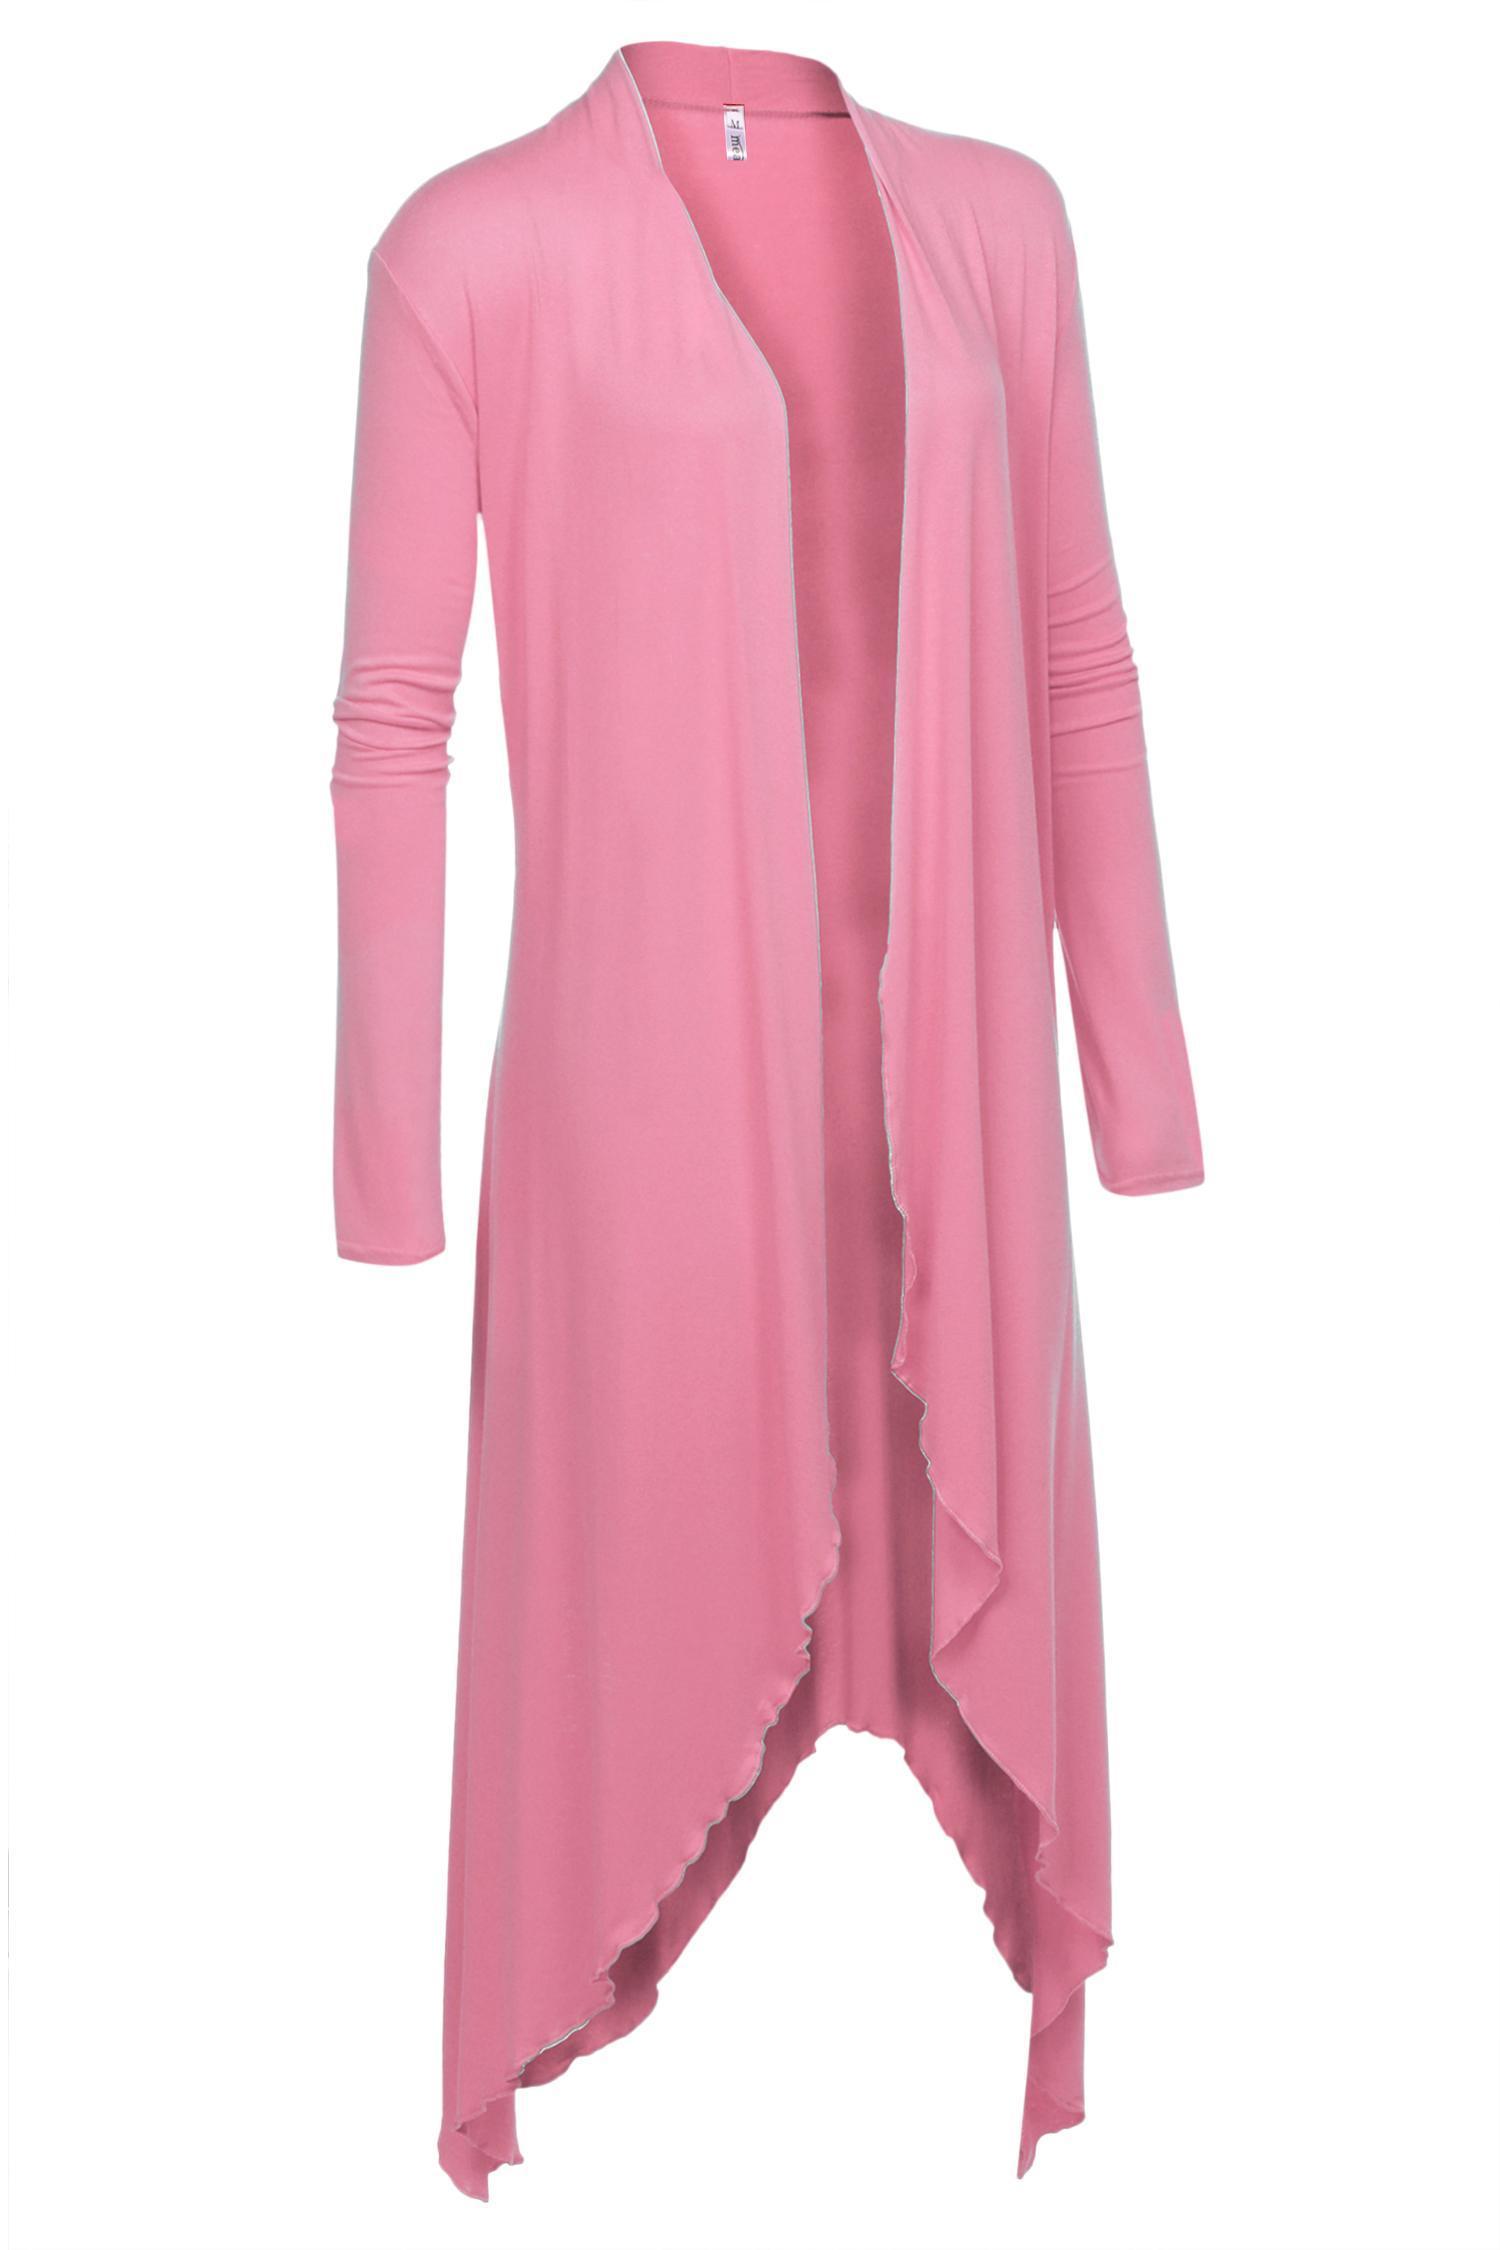 Women Irregular Open Stitch Solid Asymmetric Hem Long Cardigan Jacket 0